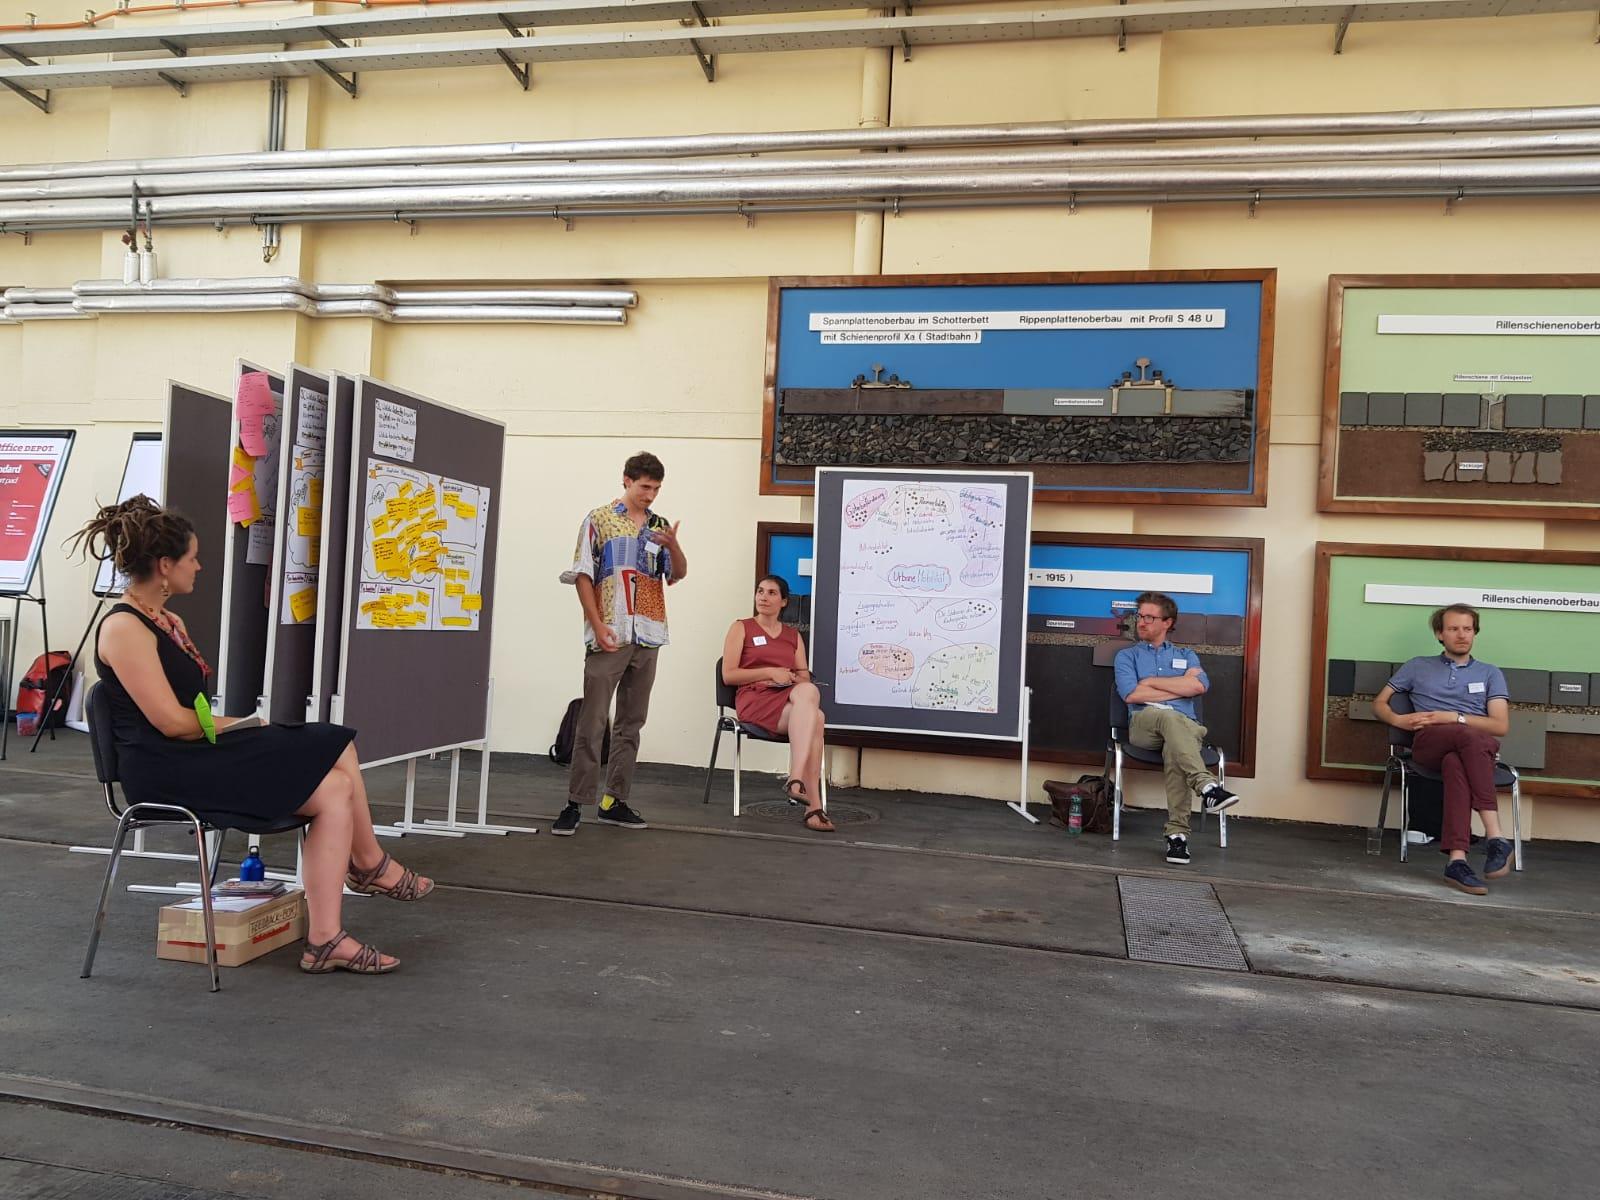 Workshop urbane Mobilität 2